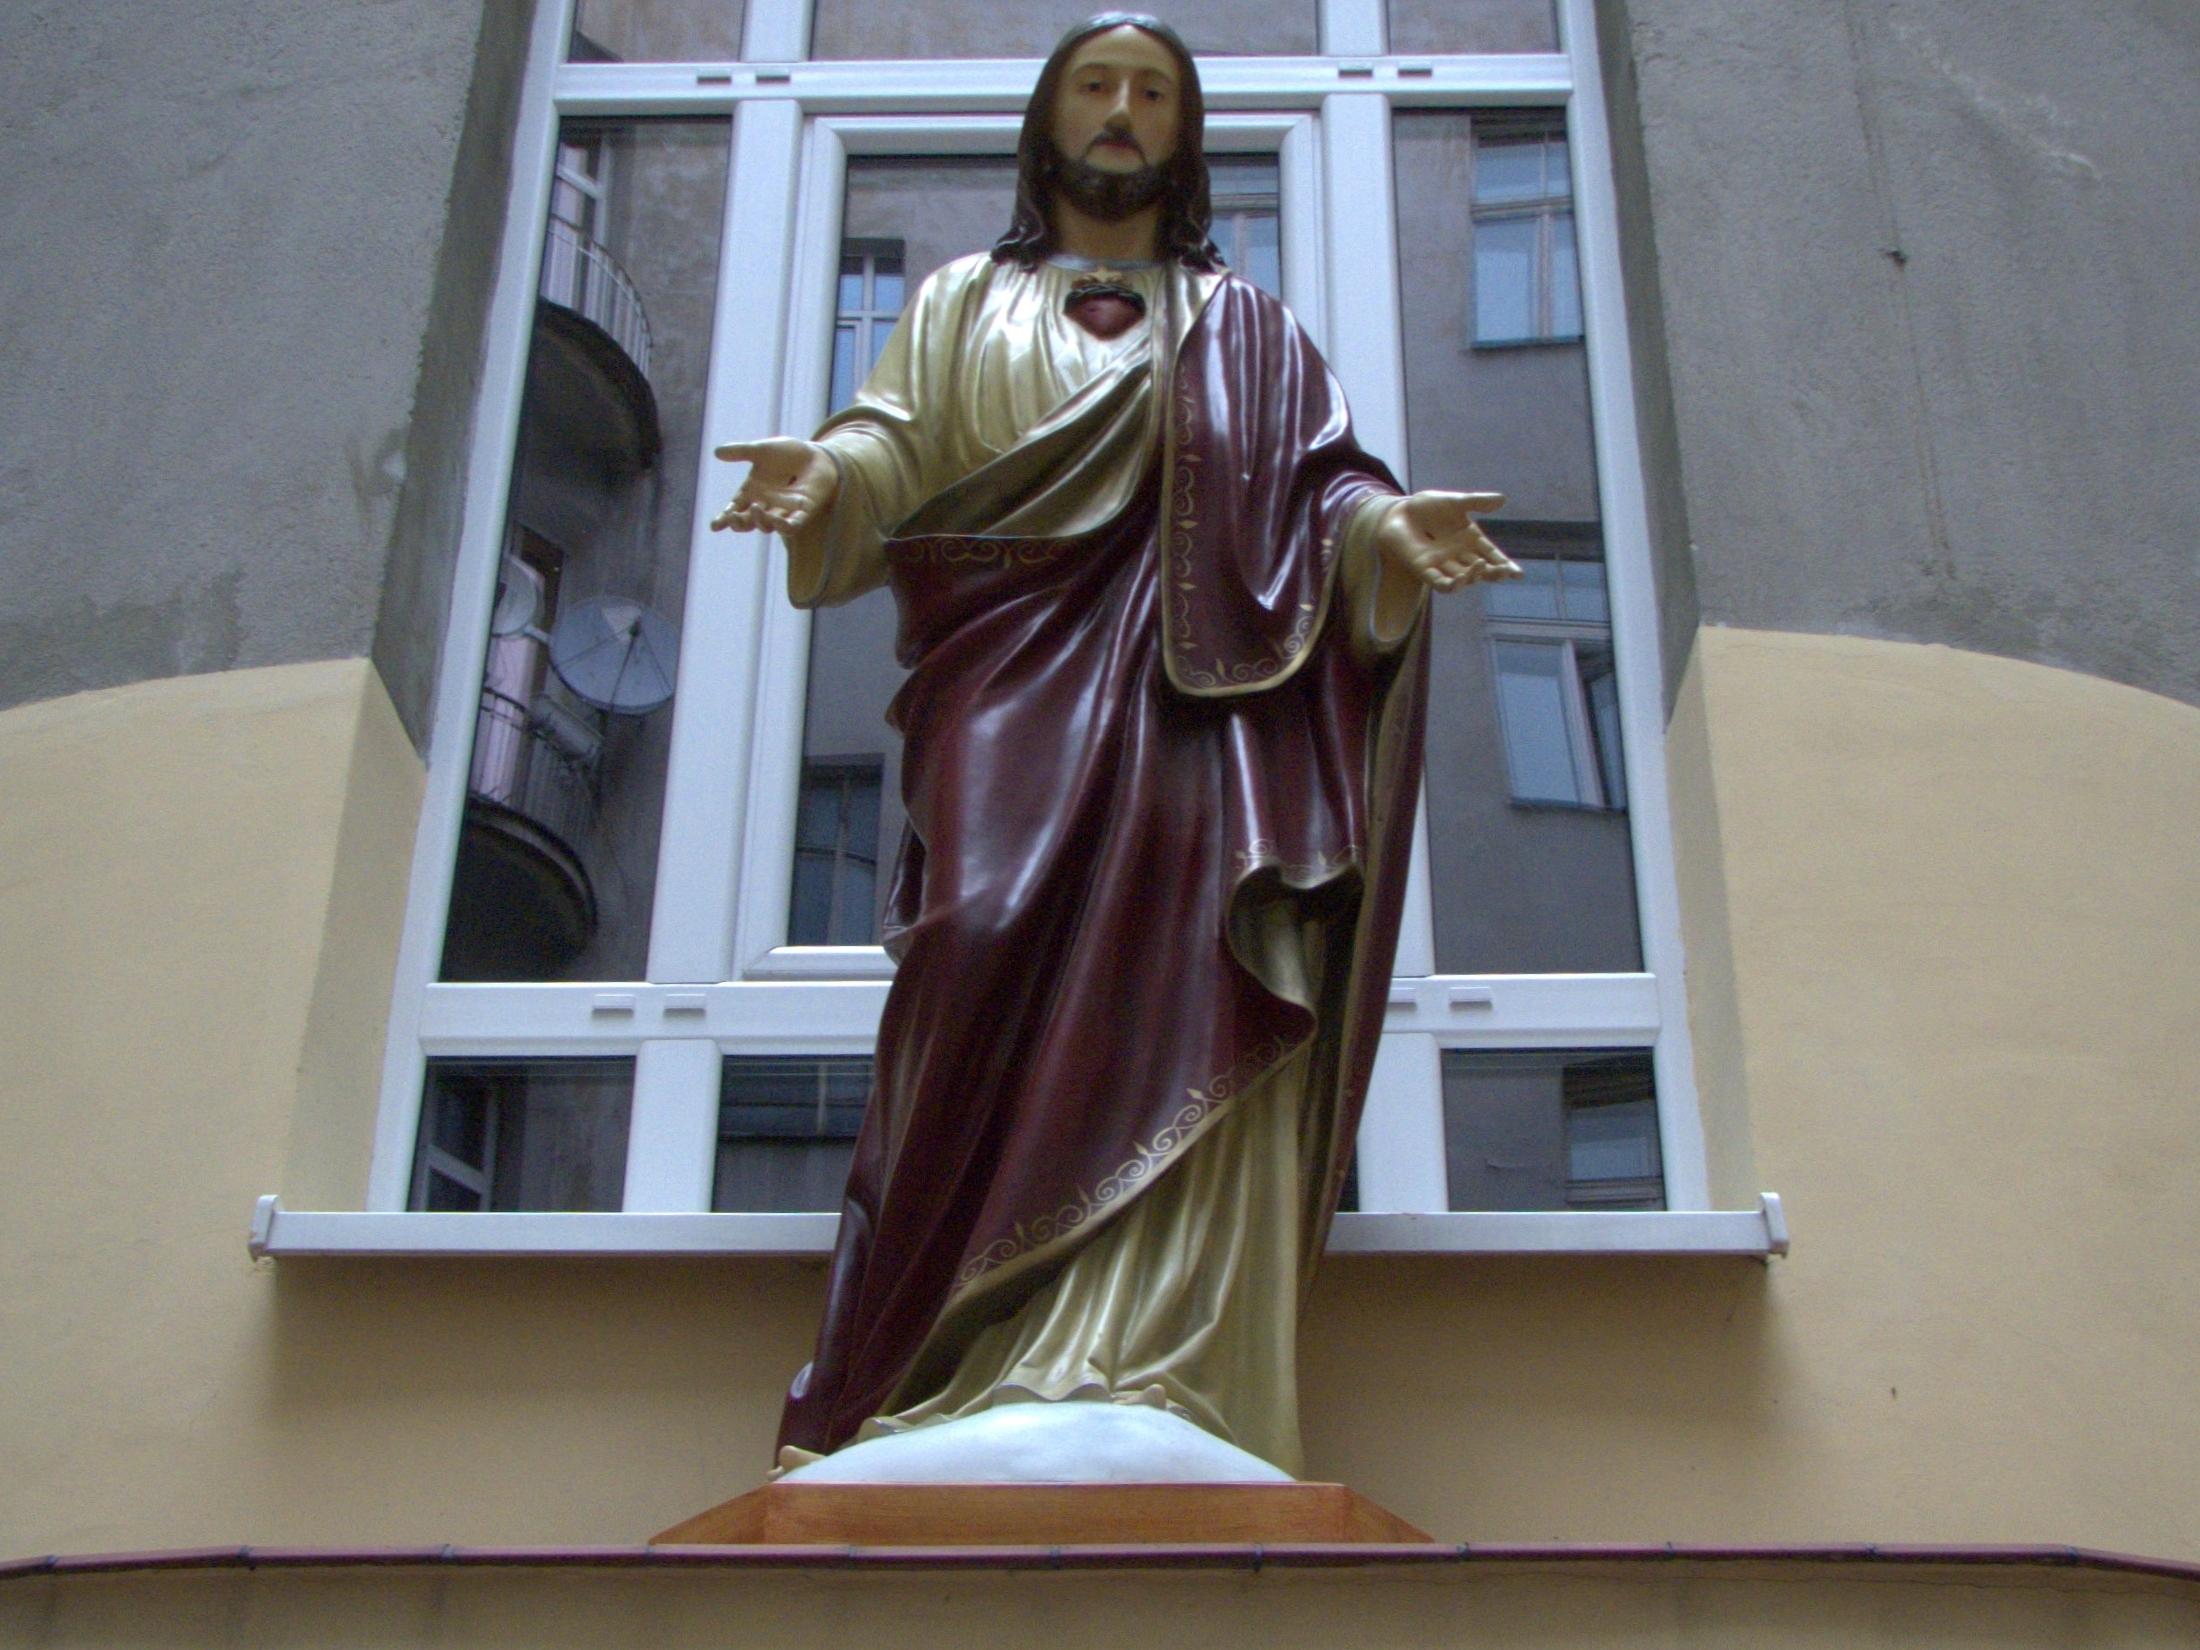 File:2007-07-25 Figurka Jezusa Chrystusa nad Kaplicą